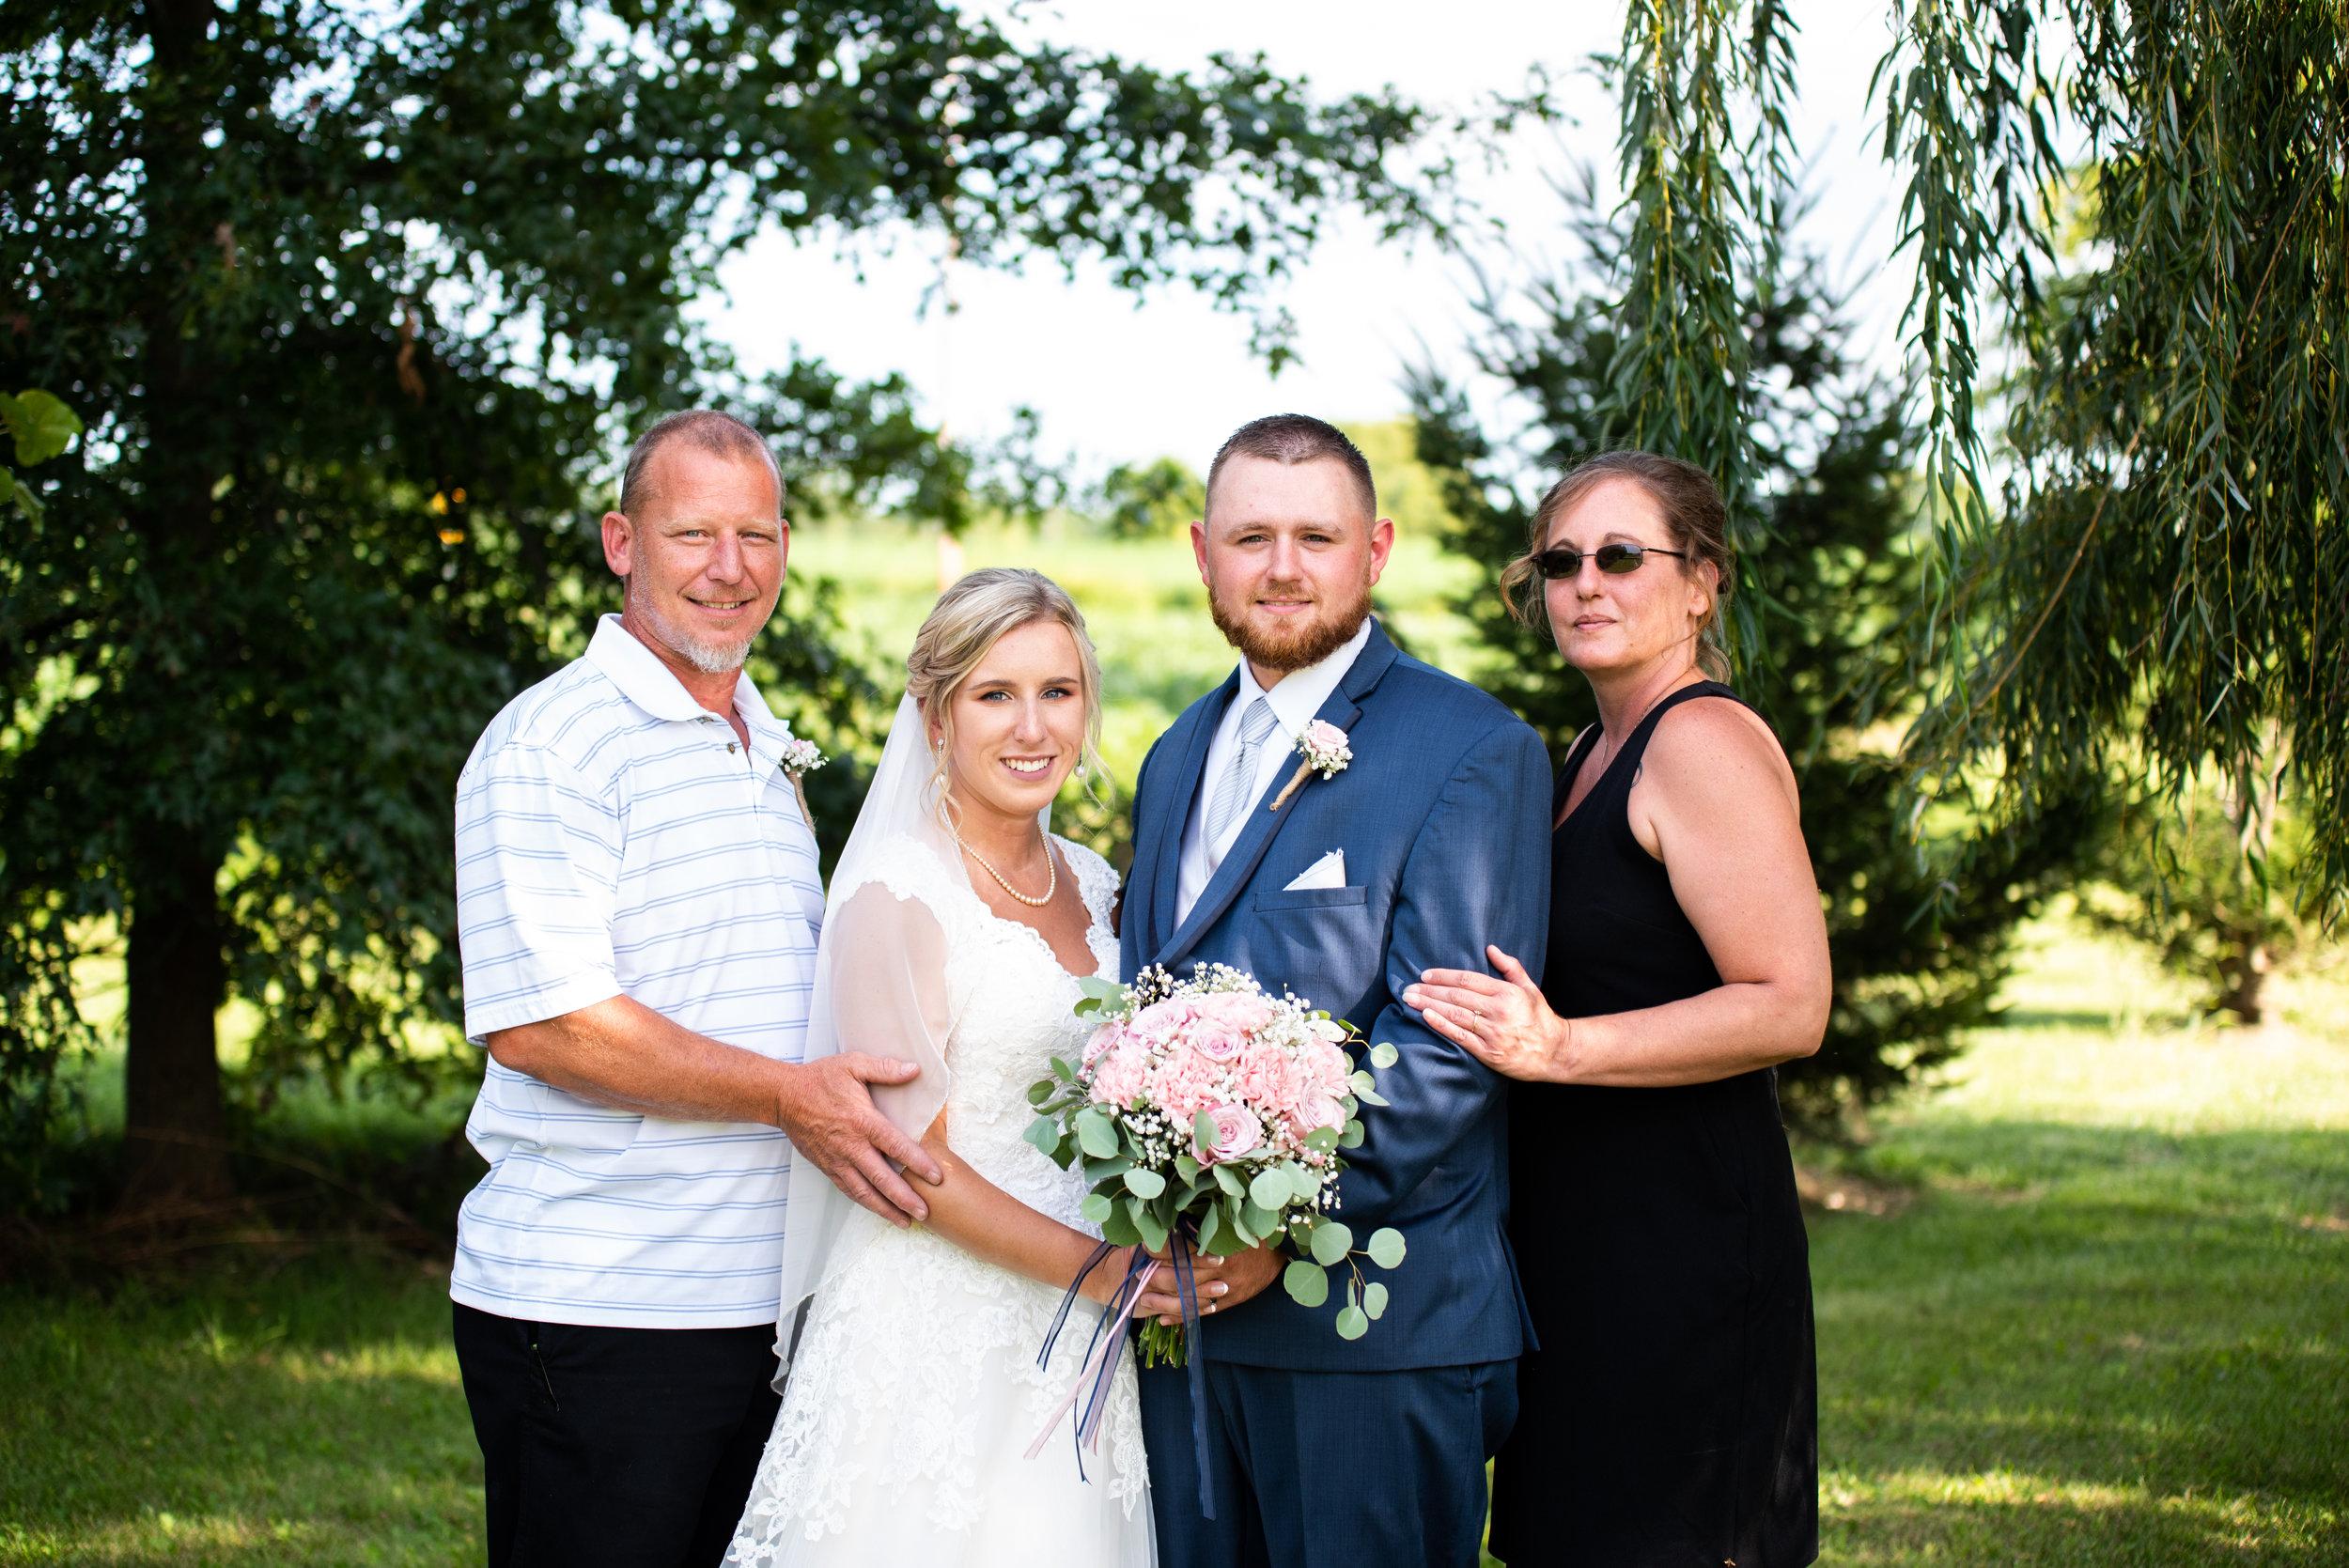 wedding (1 of 1)-121.jpg